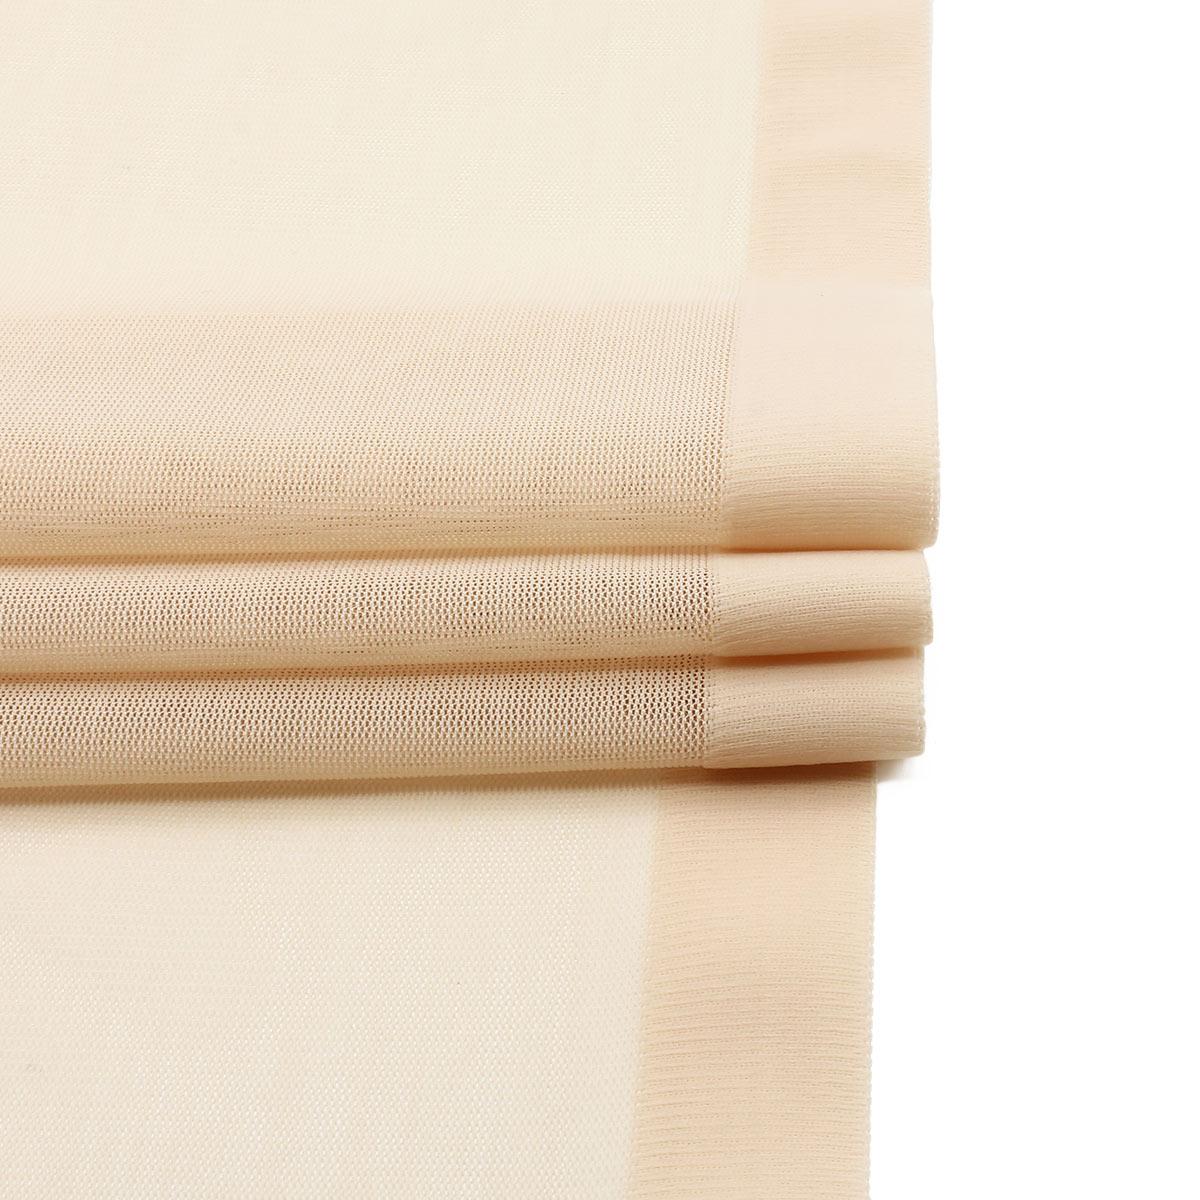 SU 91 Ткань эластичная бельевая 16 см*10